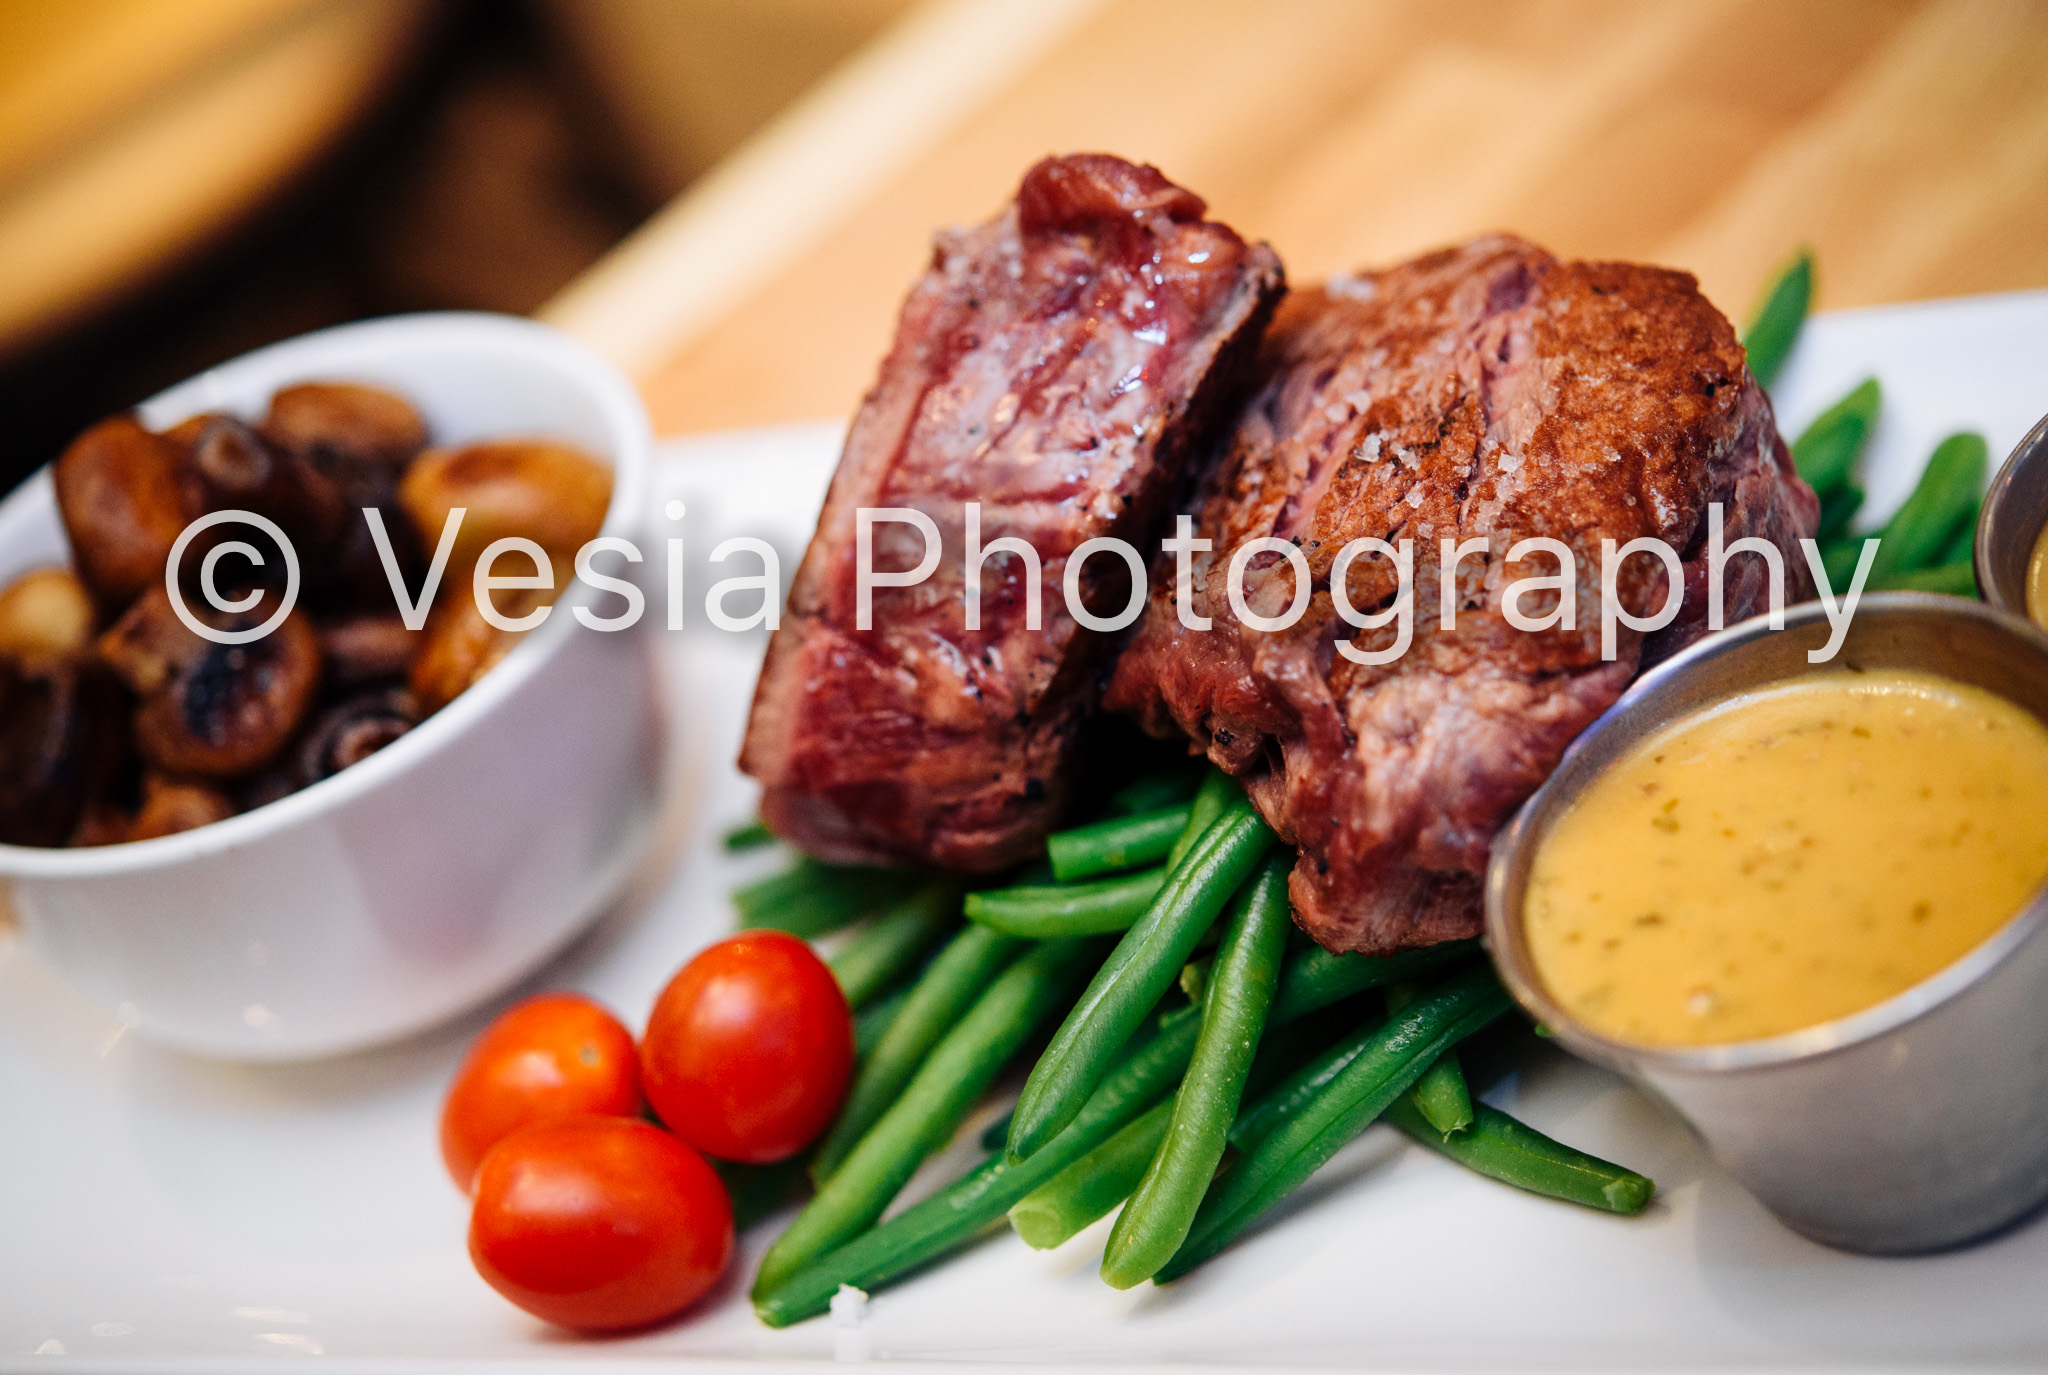 Steak&Frites_StDenis_Proofs-22.jpg